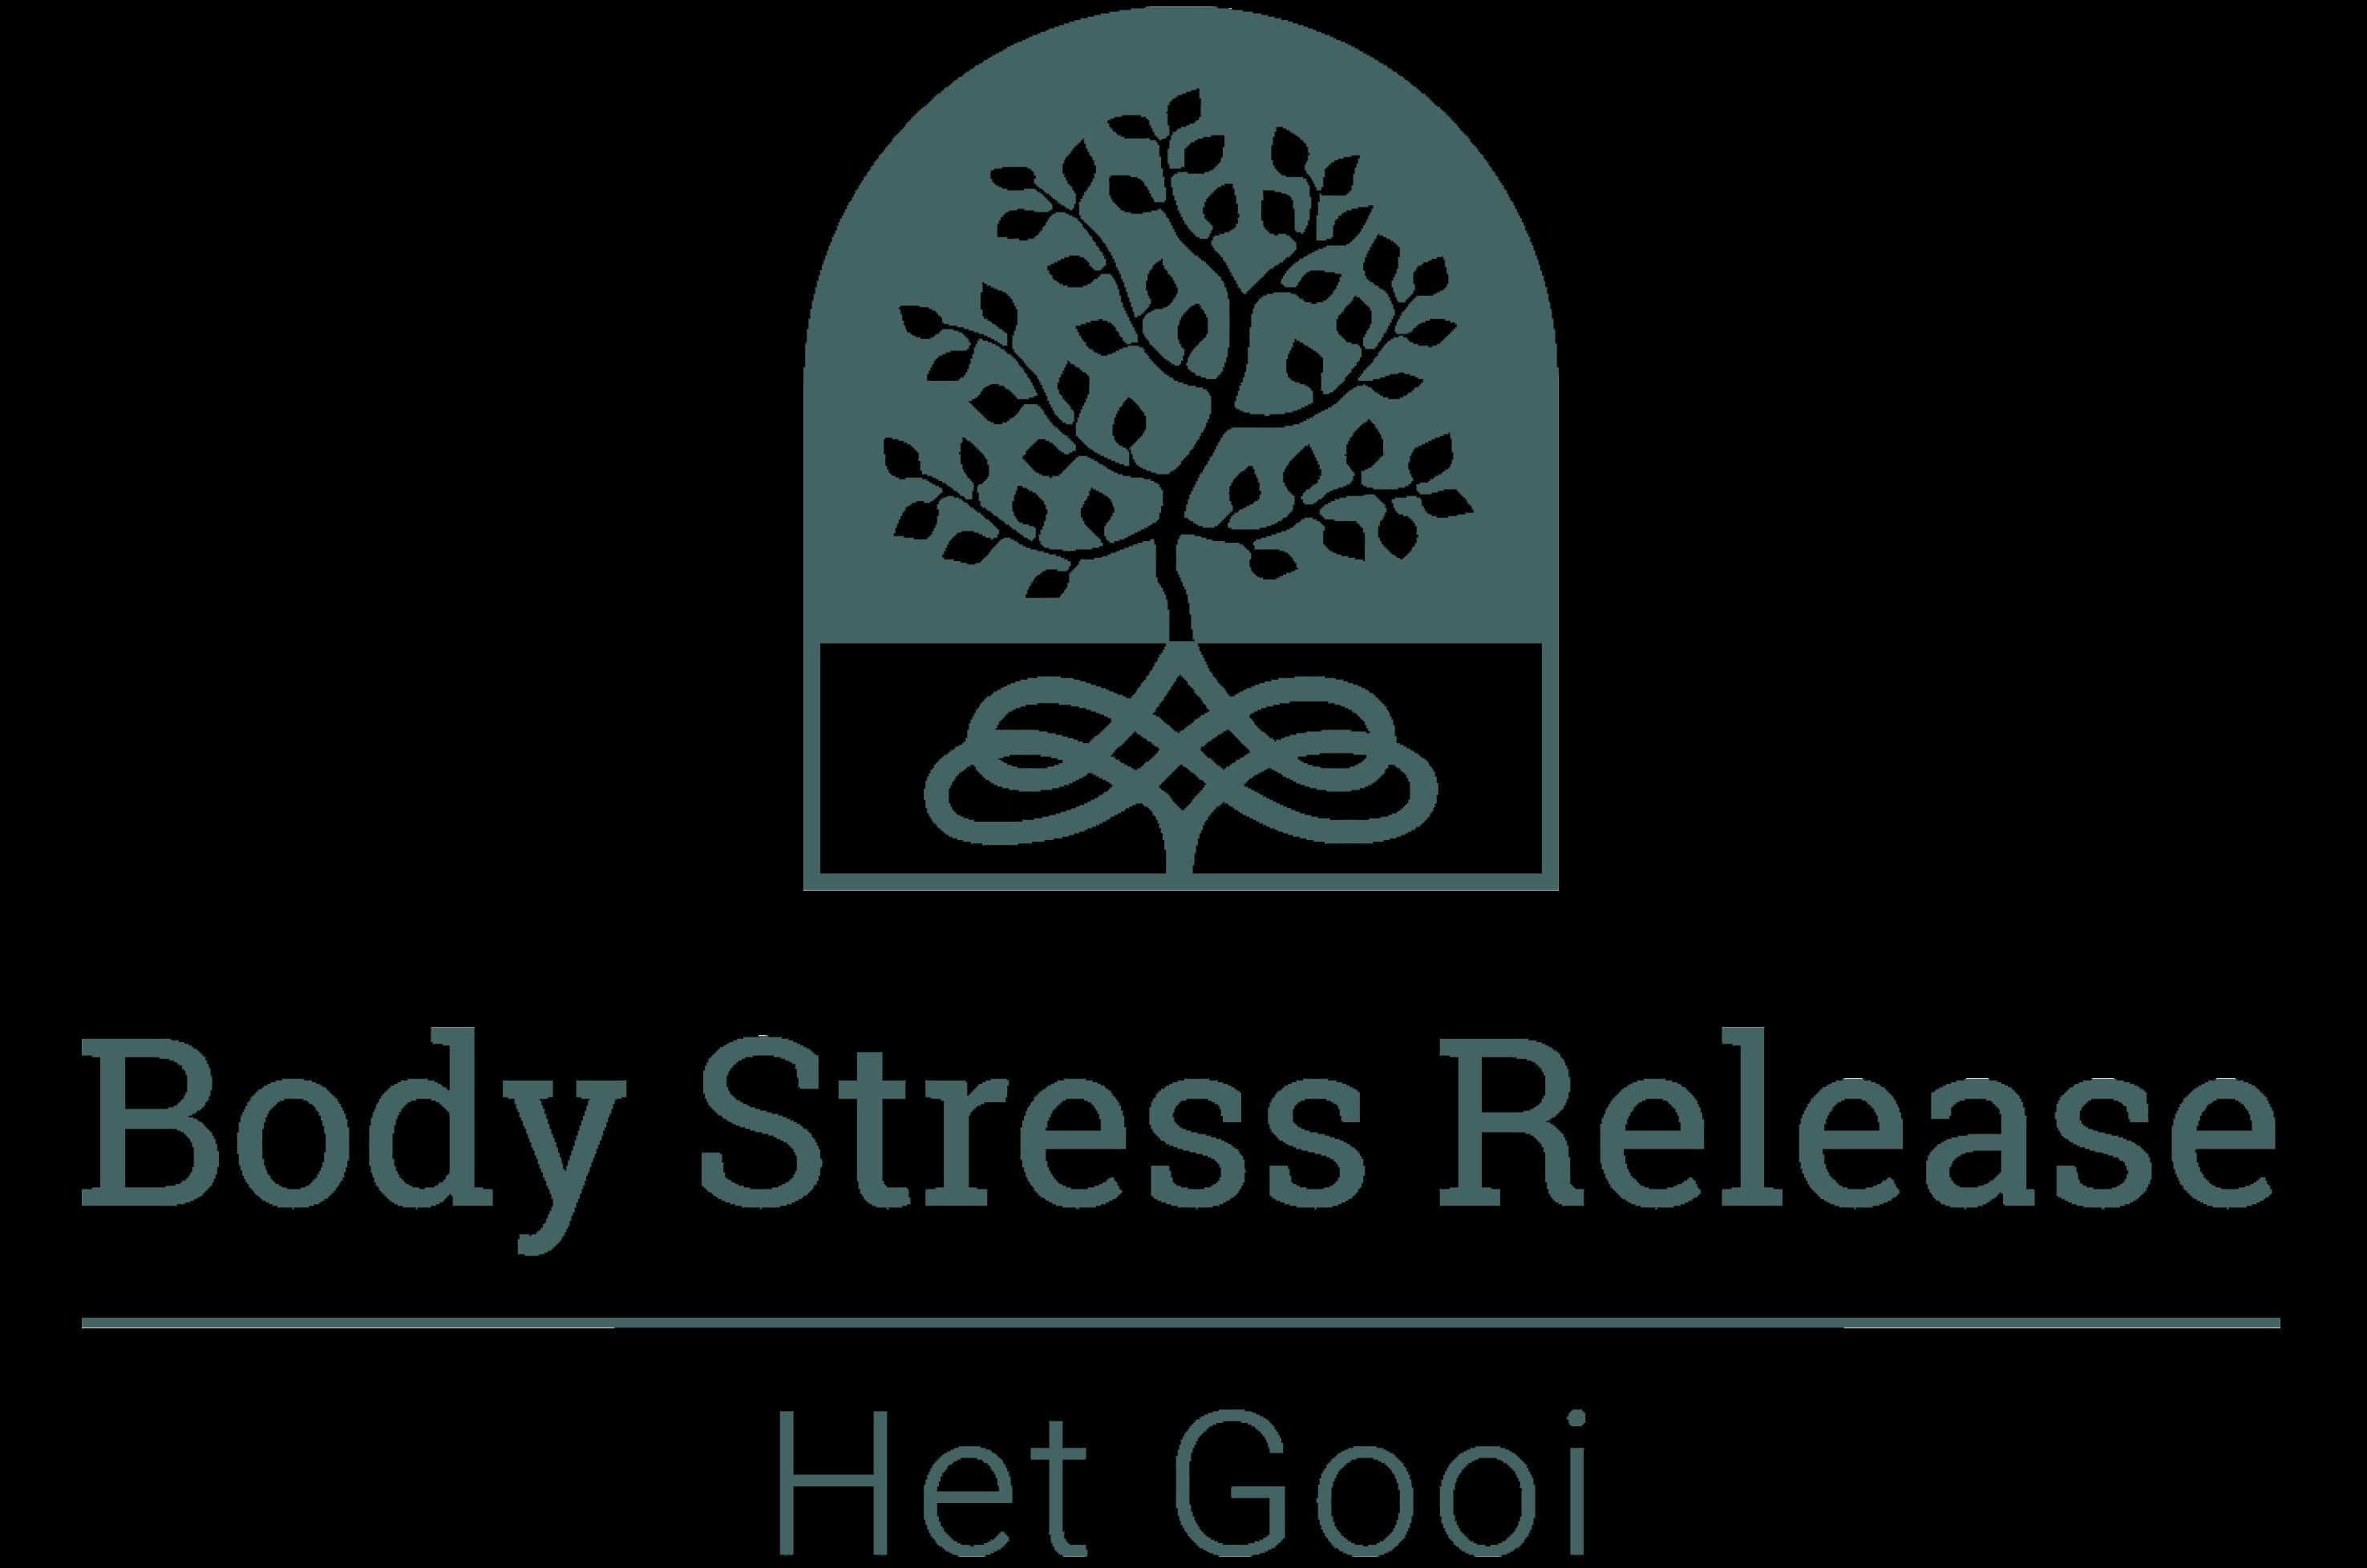 Body Stress Release Het Gooi